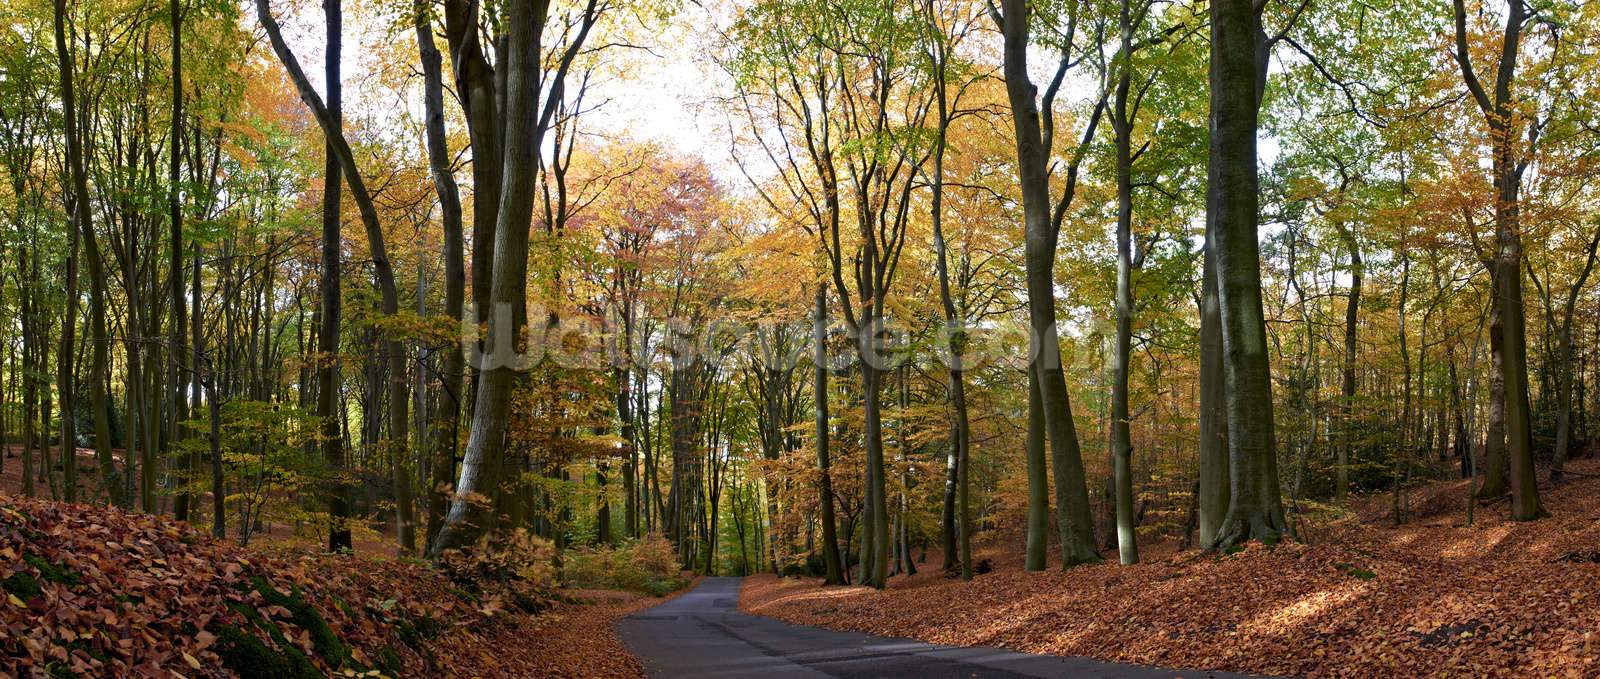 Colourful Autumn Woodland Wall Mural Photo Wallpaper Part 84